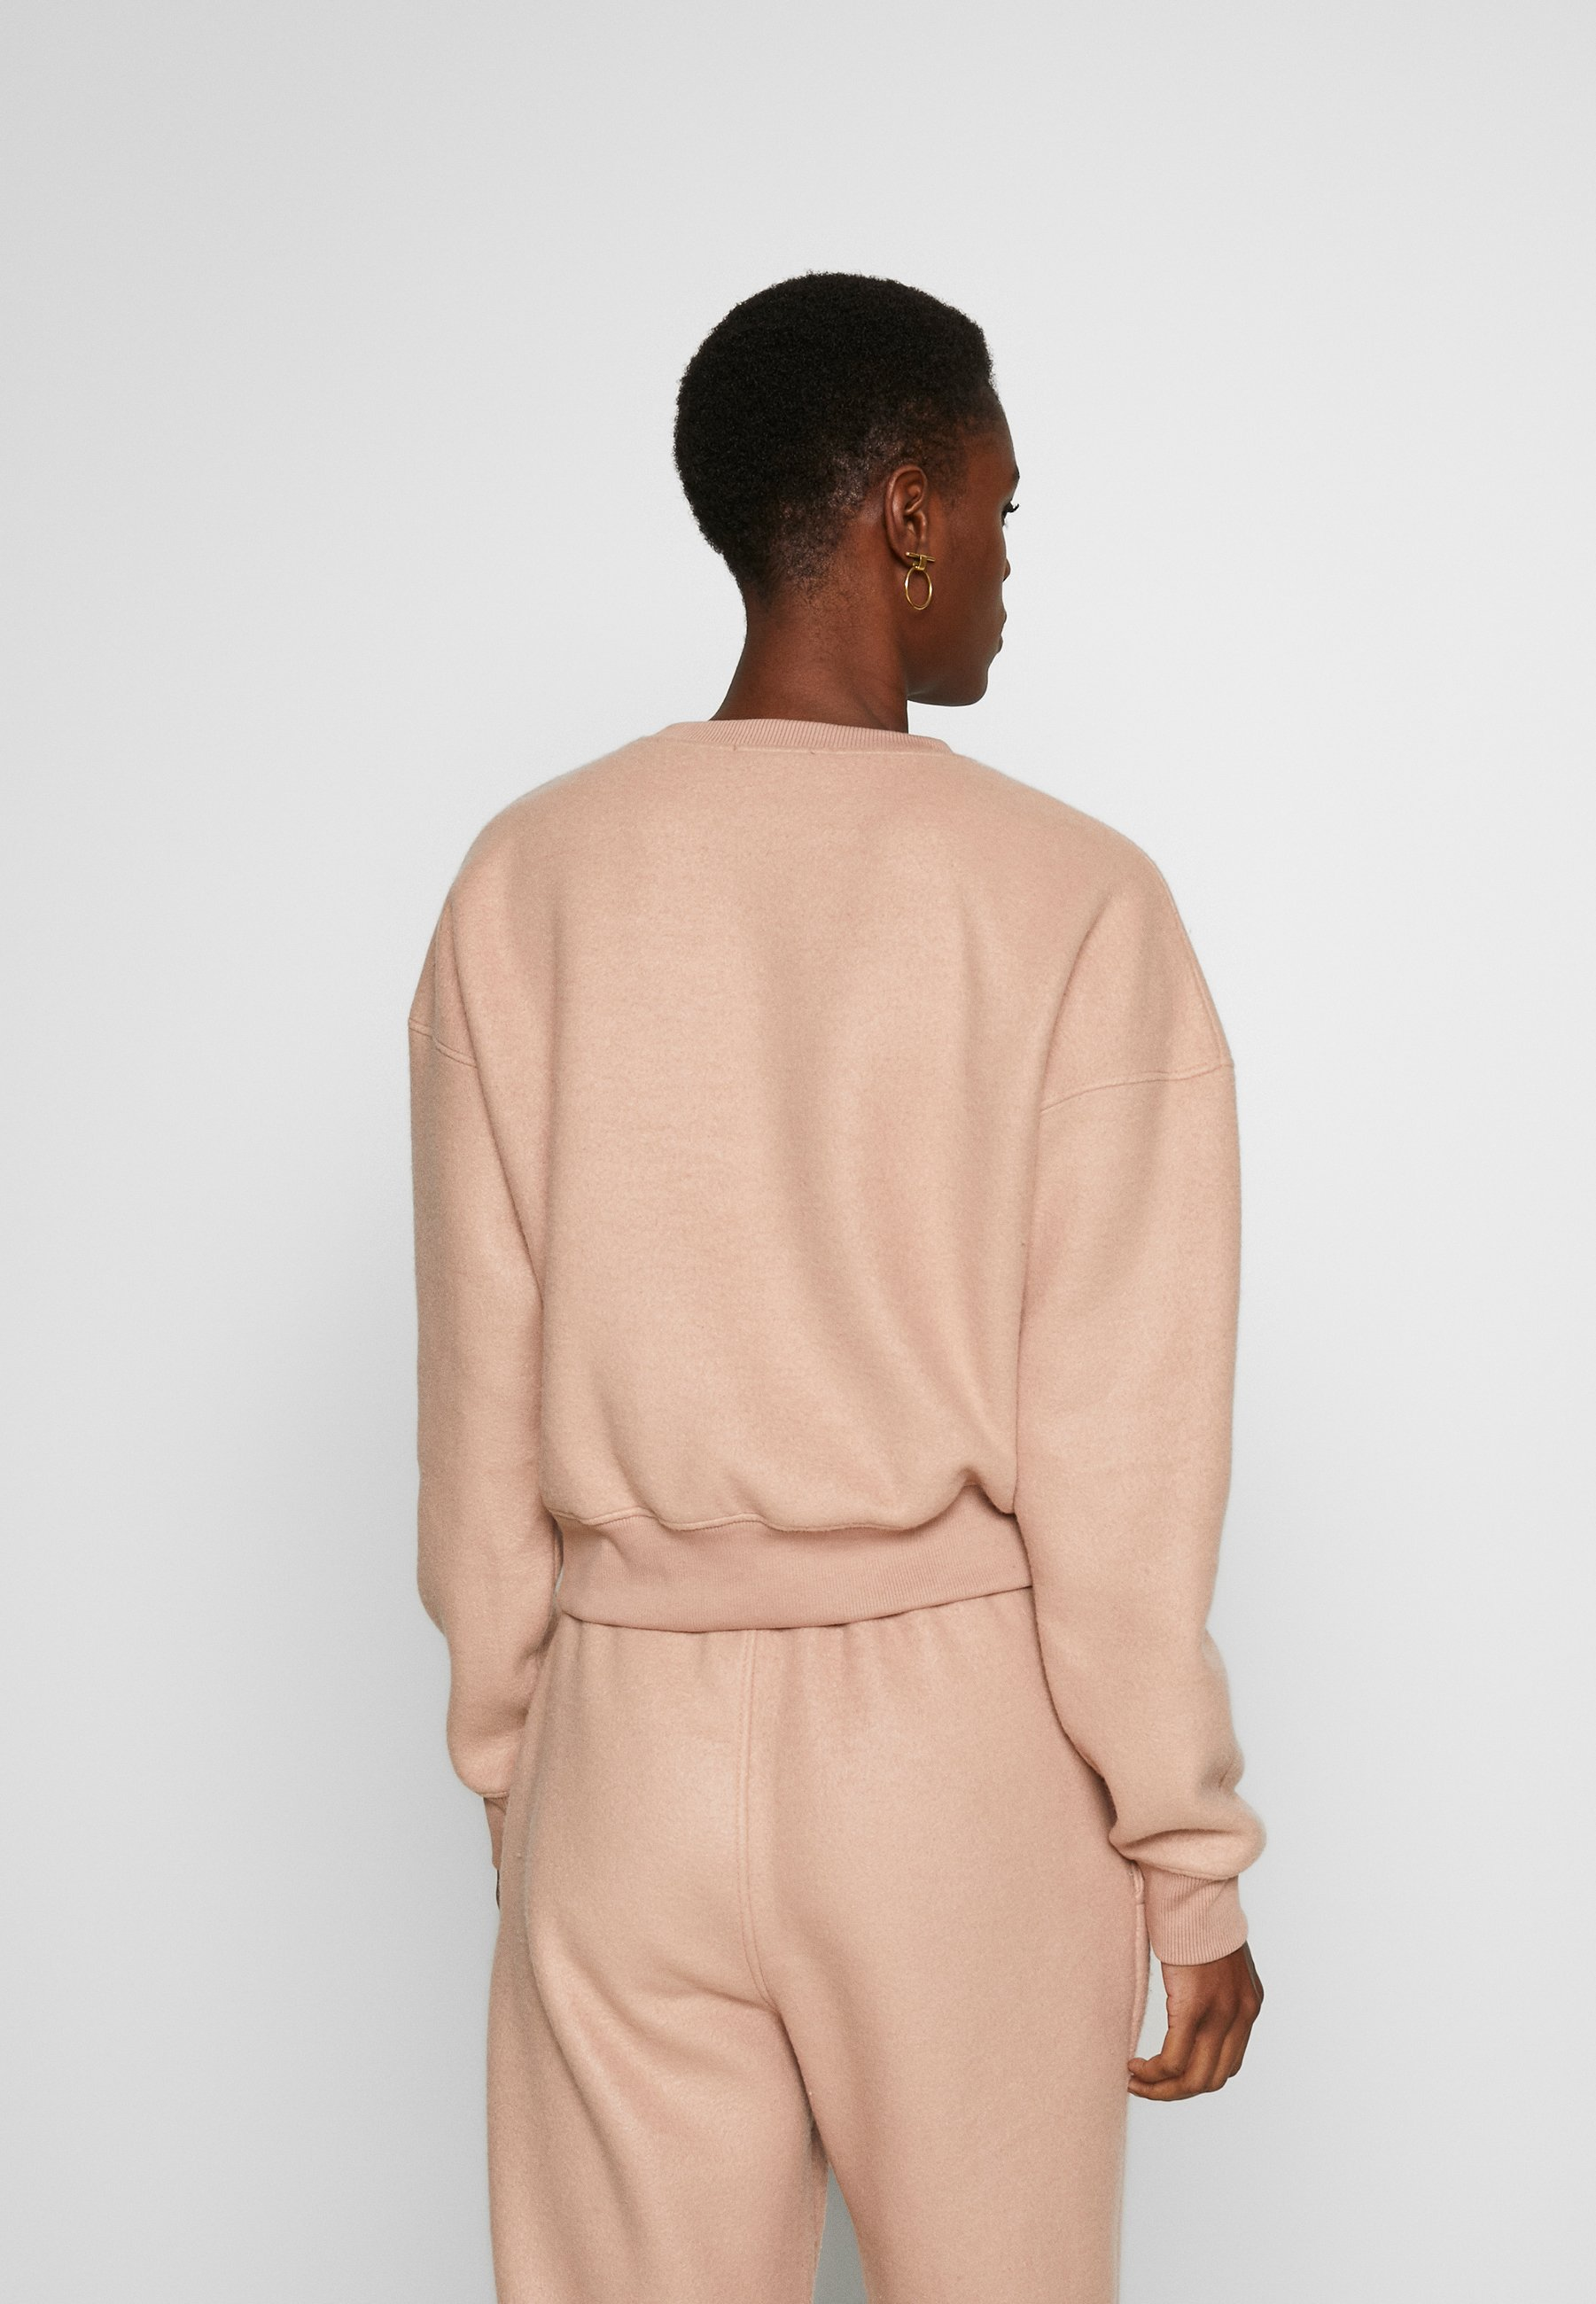 Missguided Tall Spodnie treningowe - brown